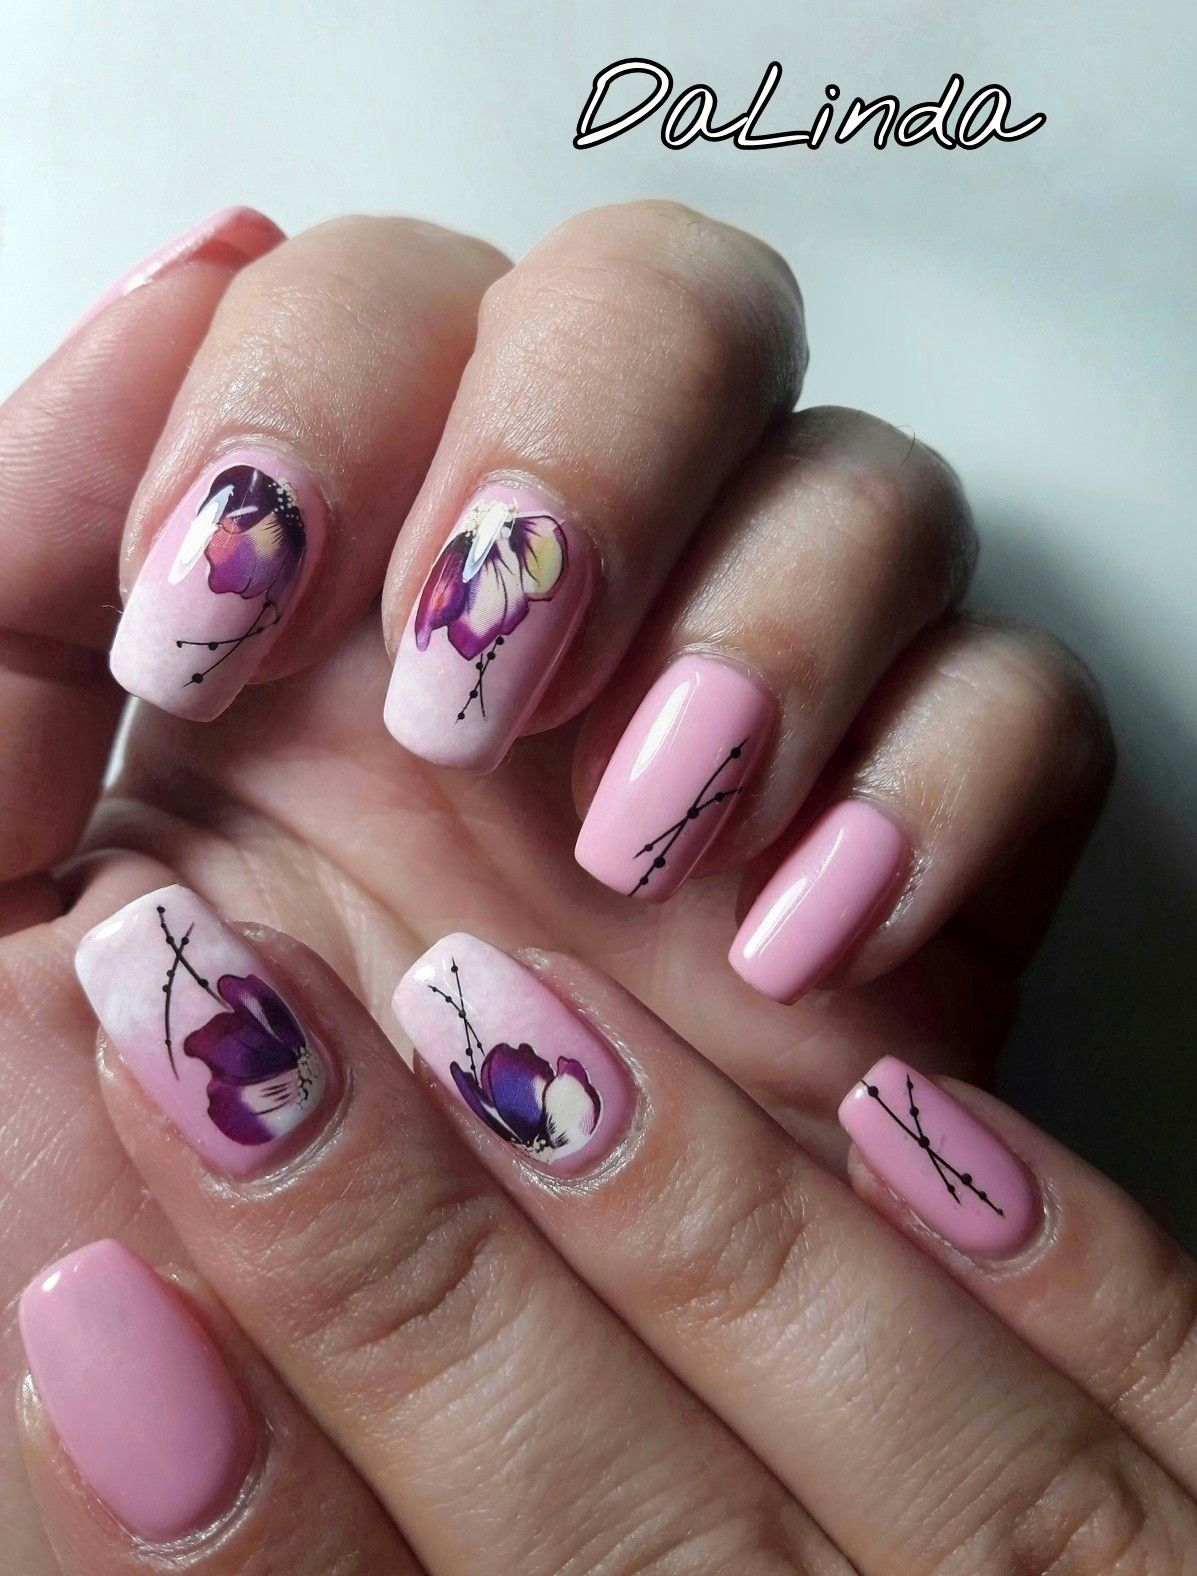 Baby boomer nail design. Flower nail art - water decals. | My nail ...